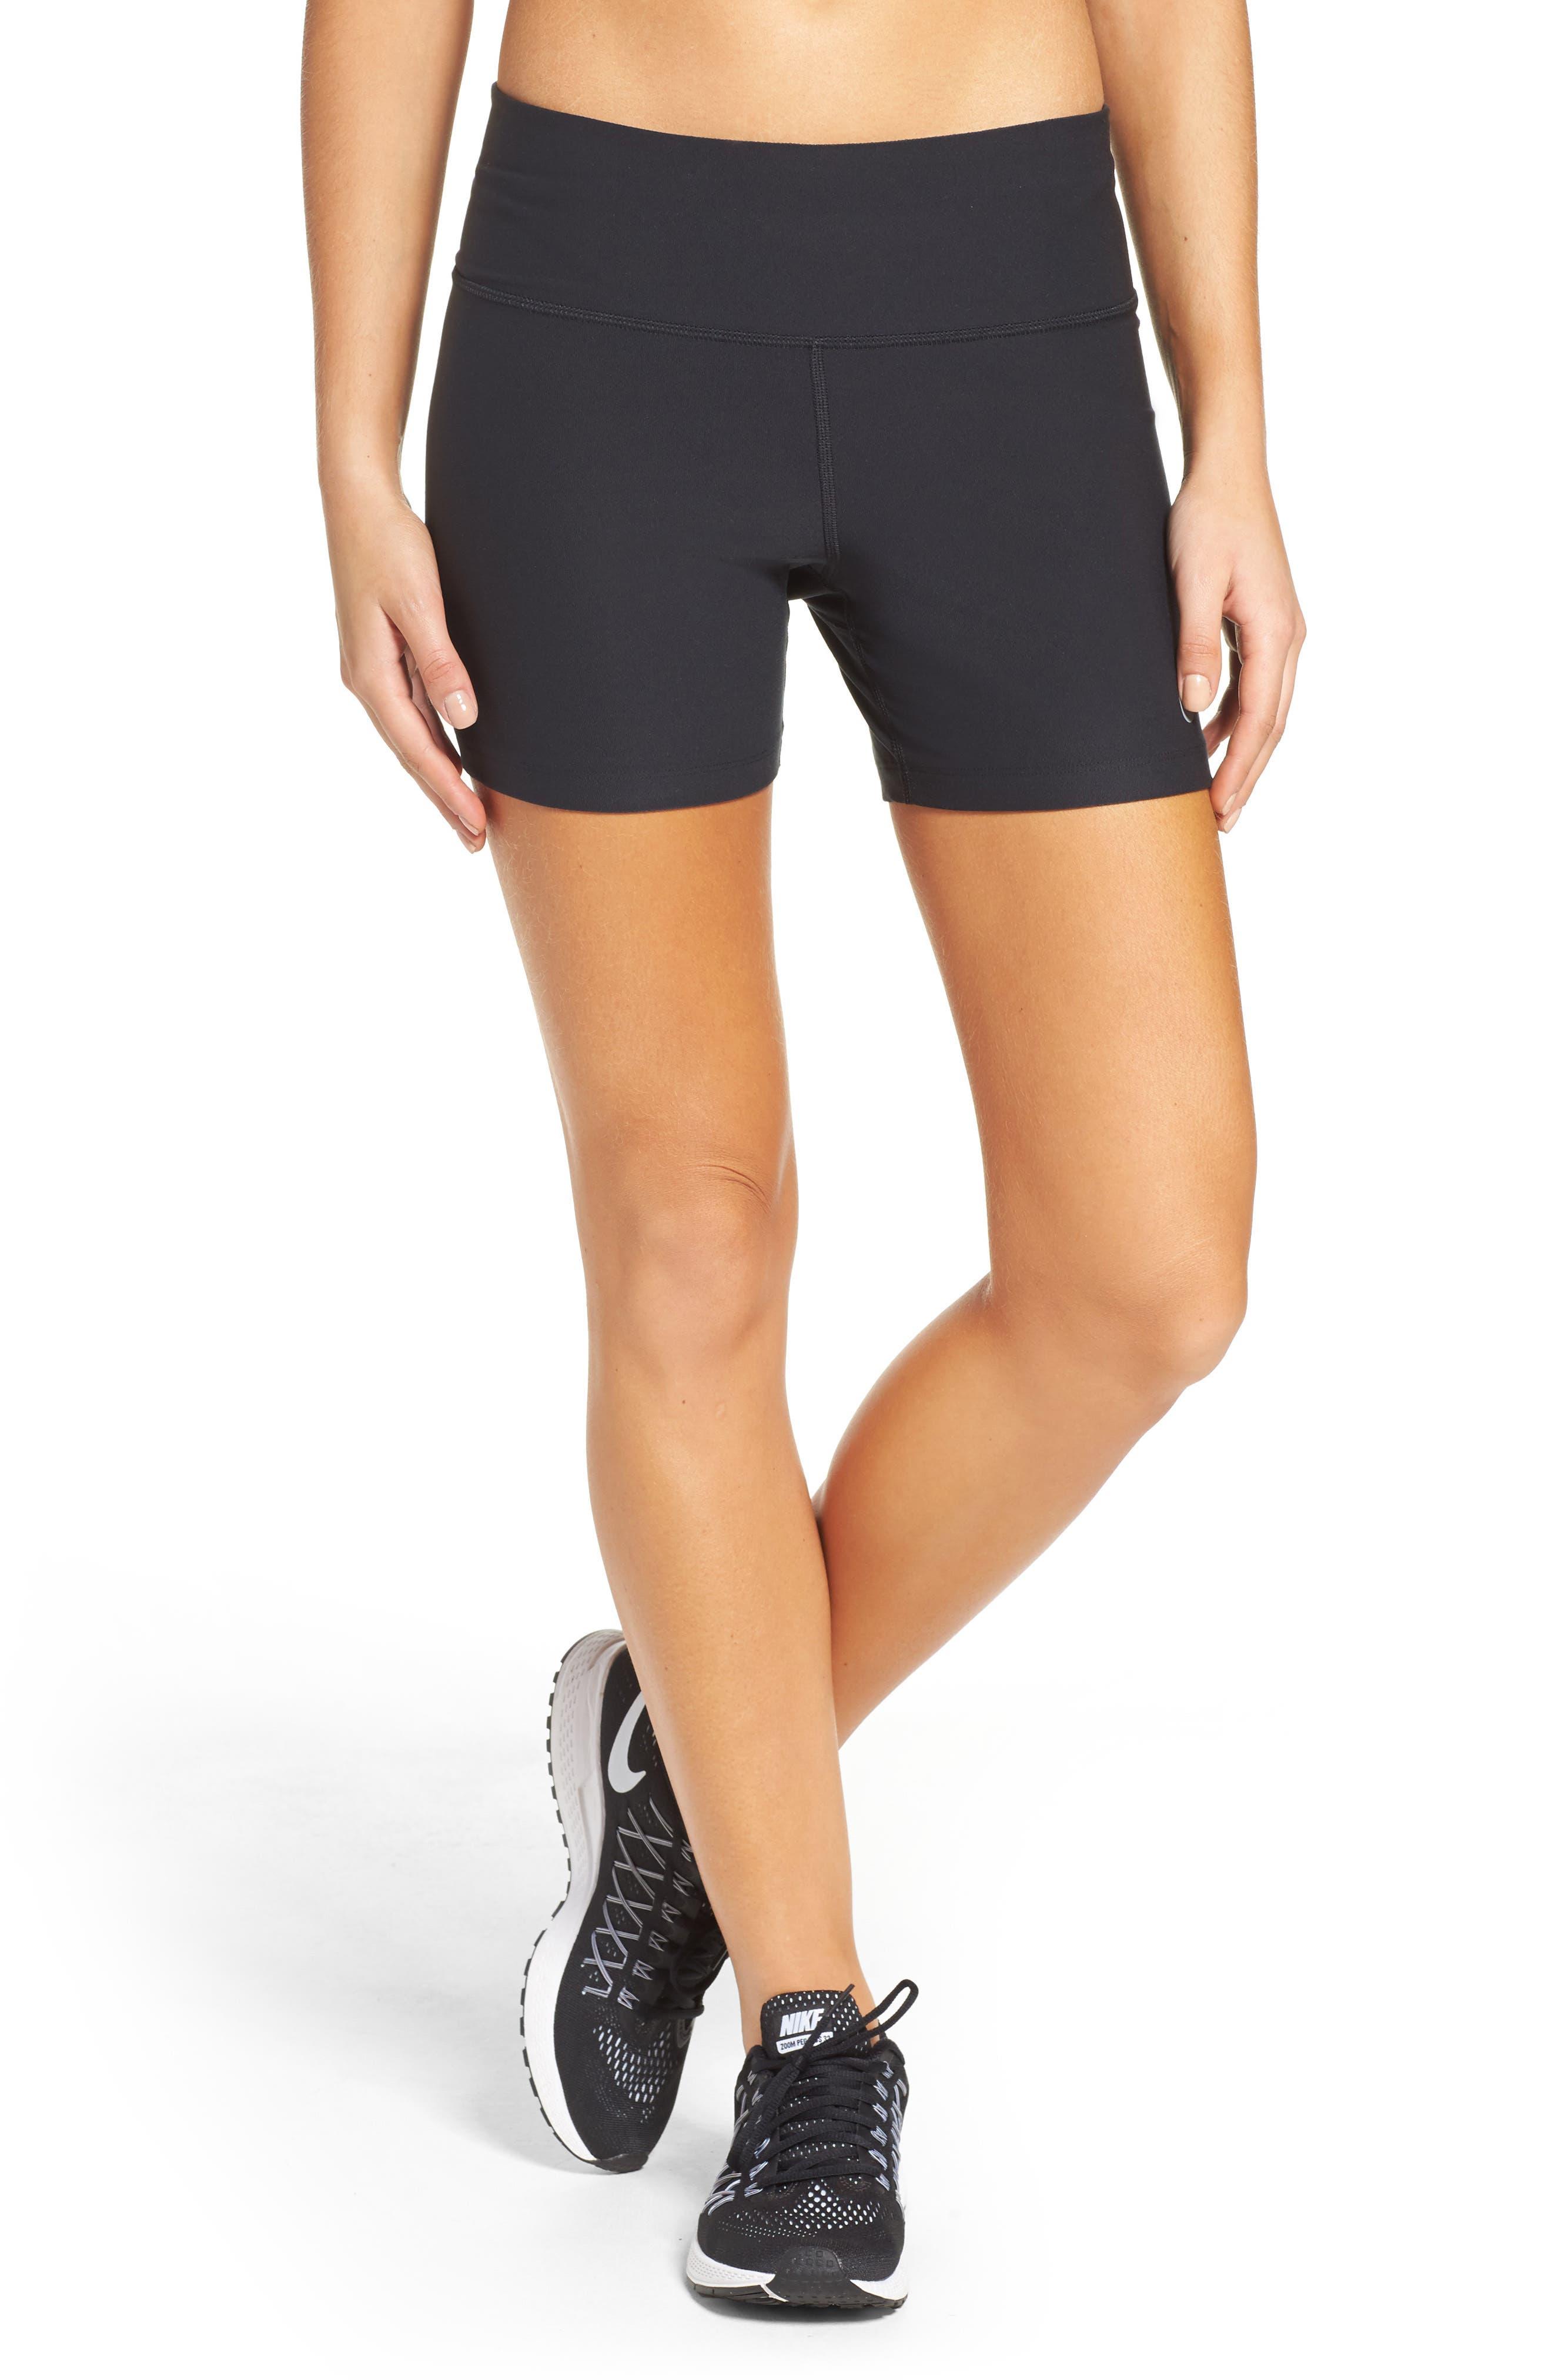 Power Shorts,                         Main,                         color, Black/ Cool Grey